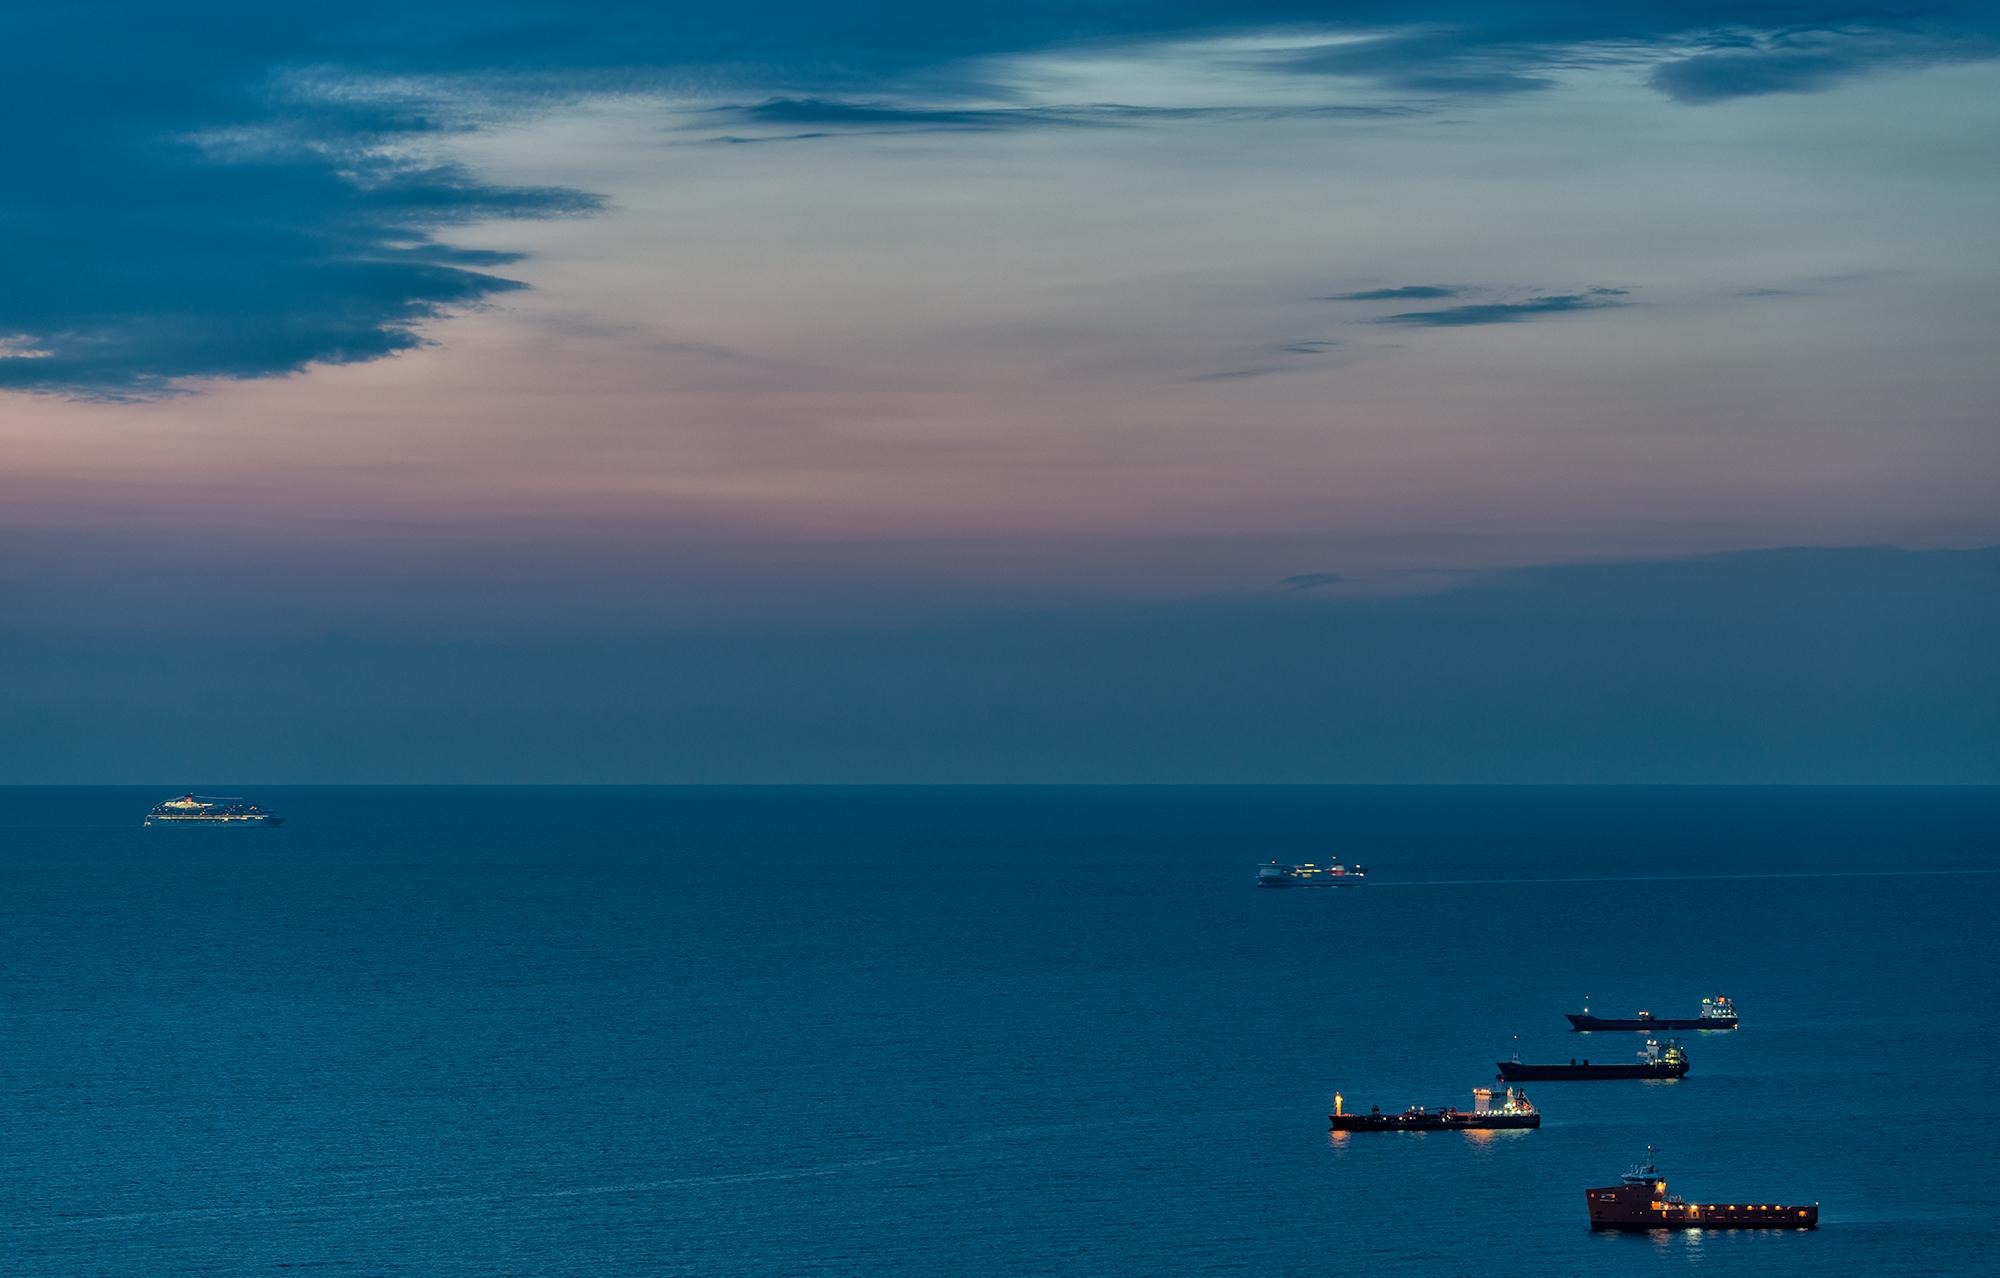 Awaiting Port Call. Barcelona, 2015